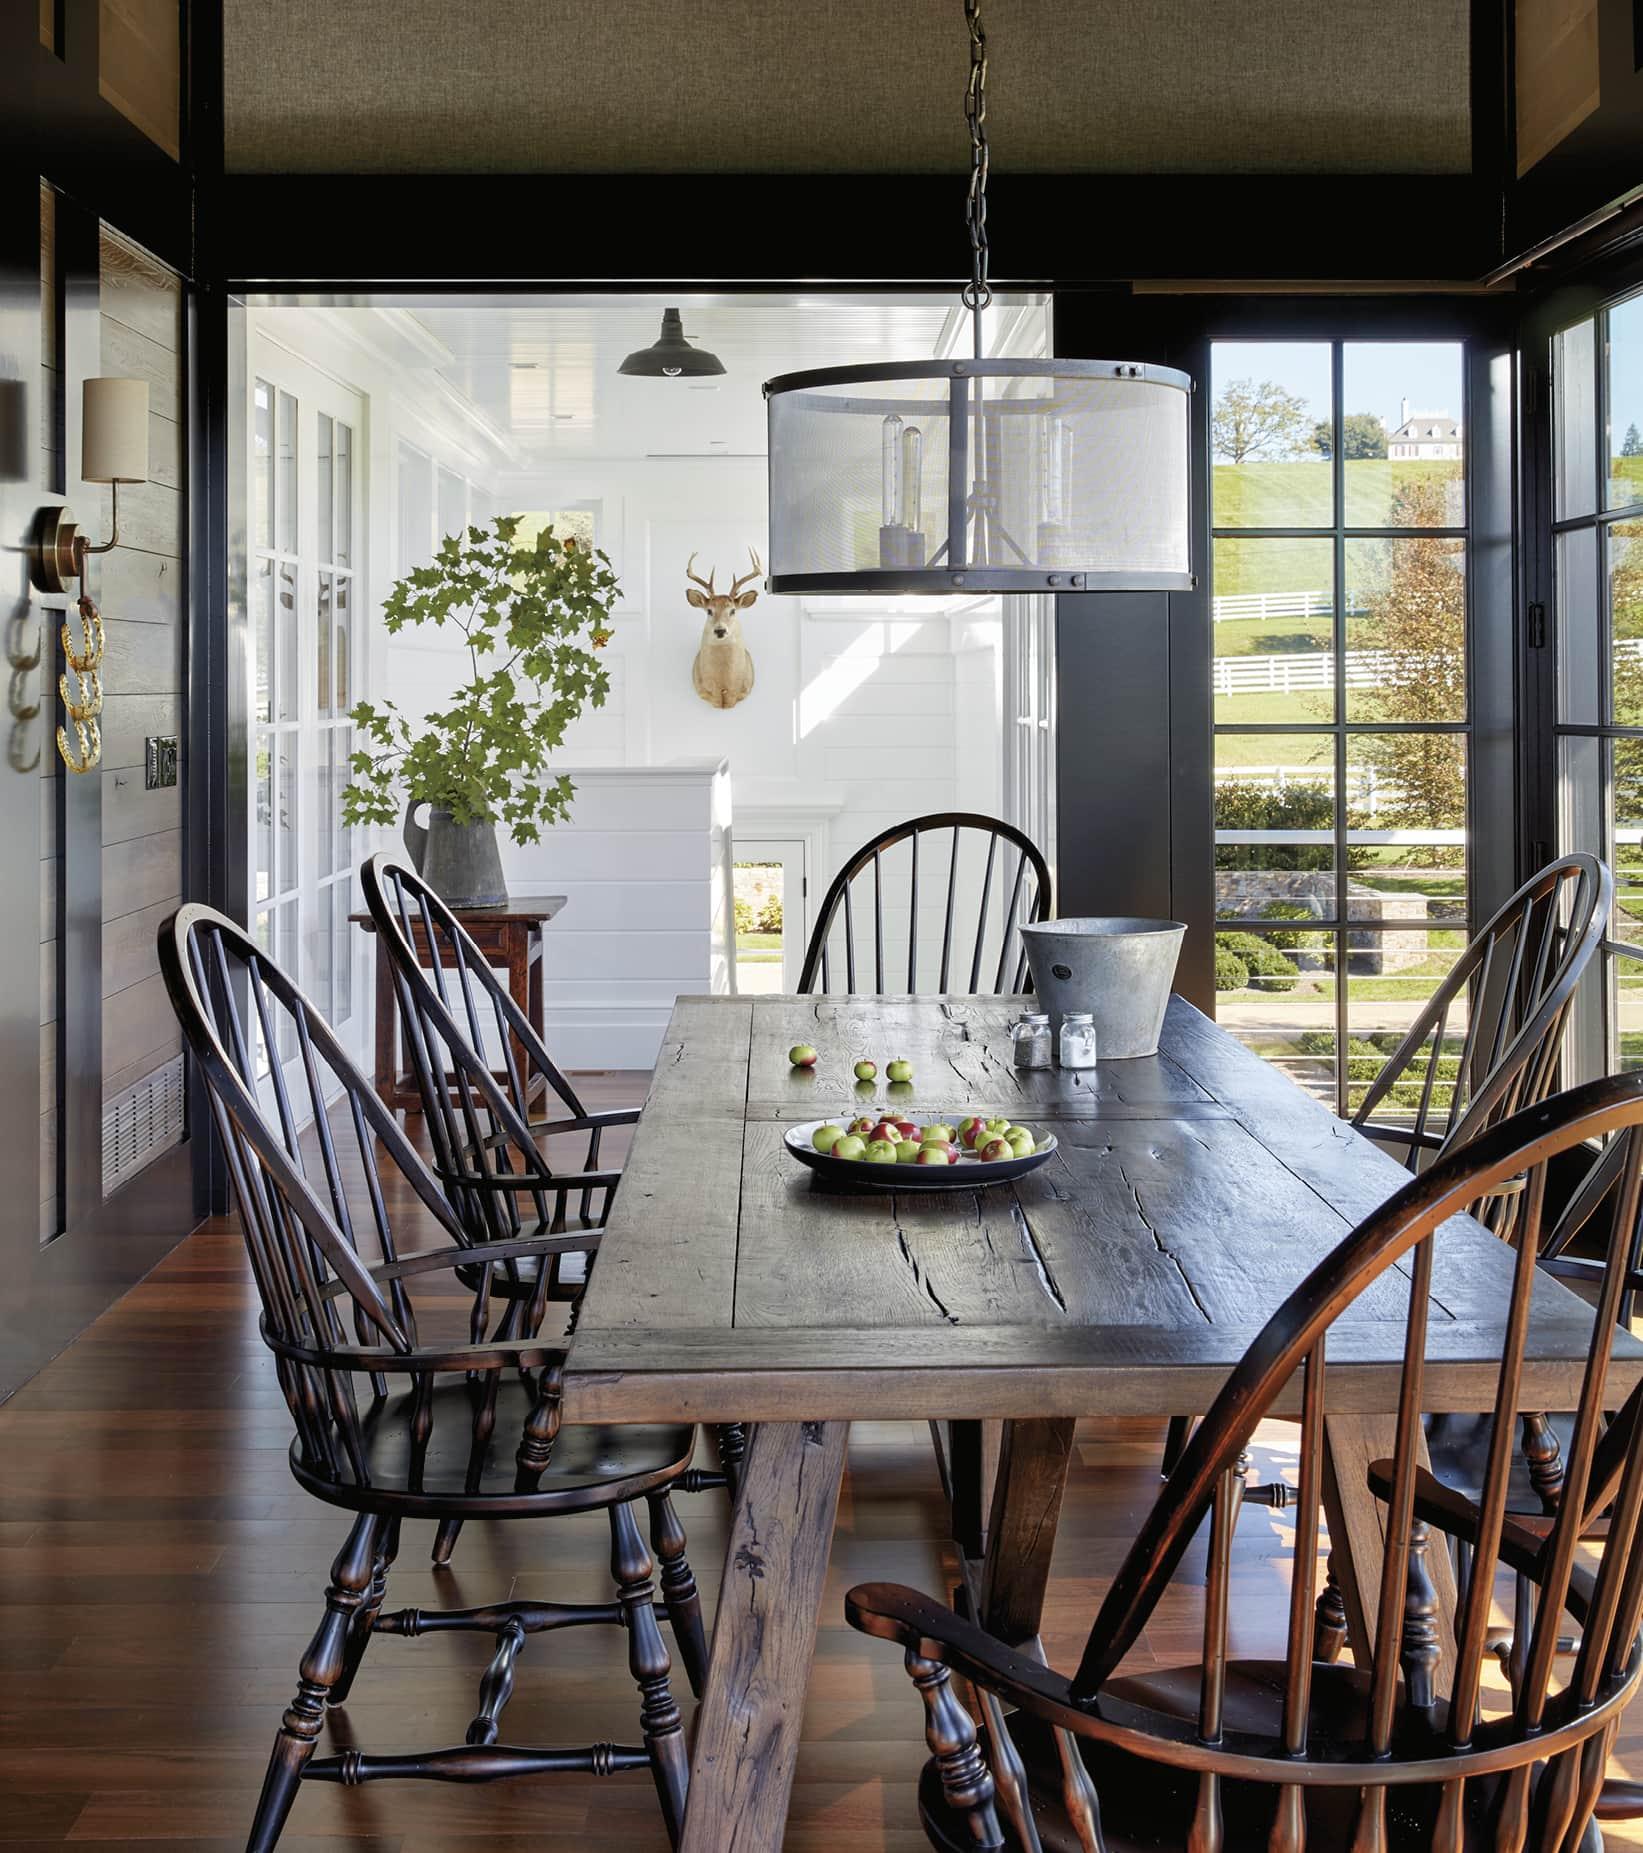 Sunny dining area with a farmhouse style table